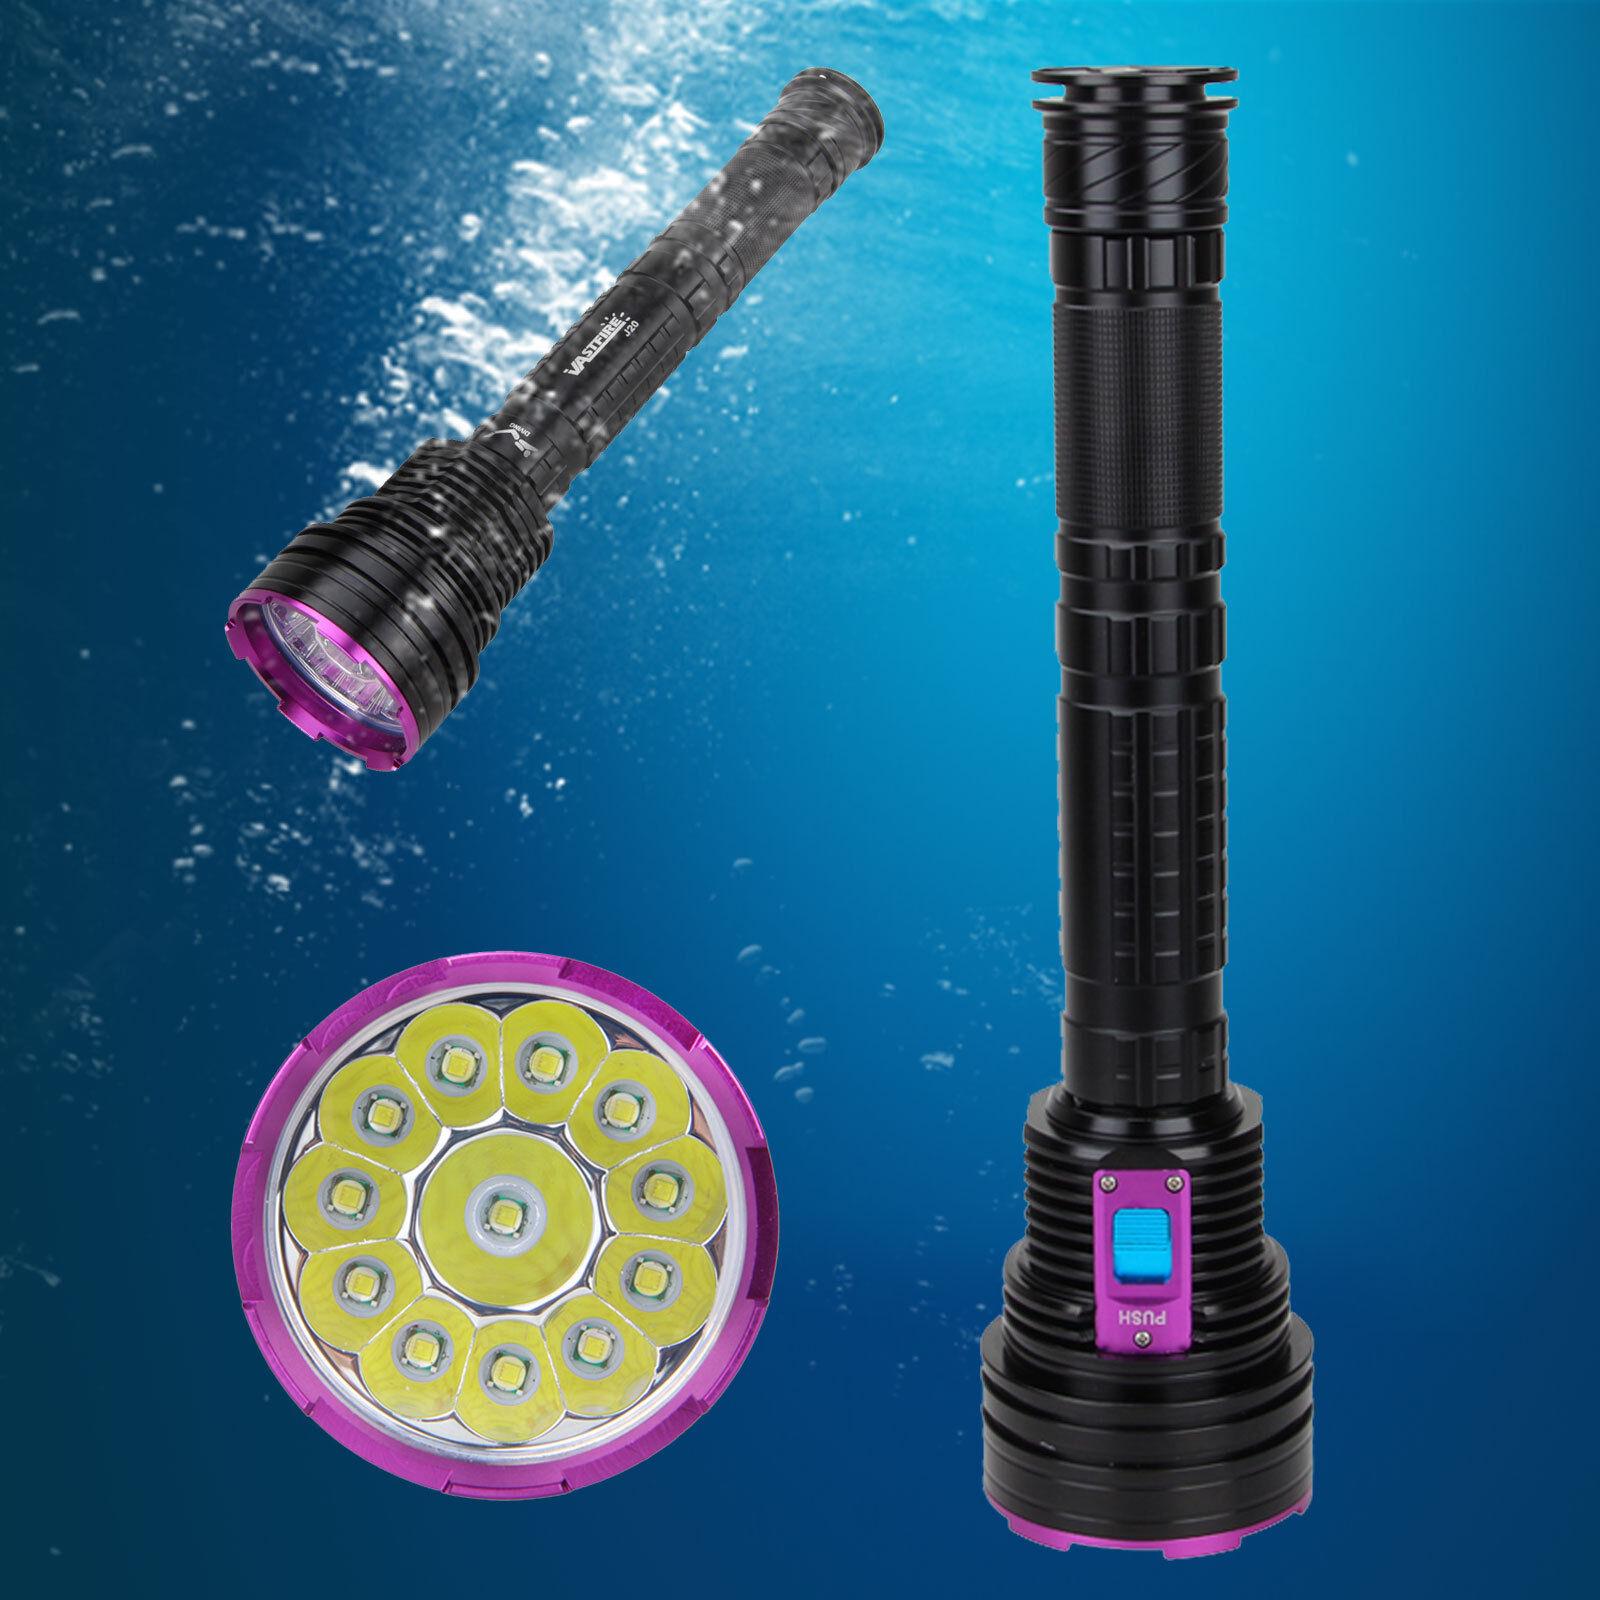 Powerful 30000Lm Handlampe 12xXM-T6 LED Handlampe 30000Lm Taschenlampe 26650 Tauchlampe bis 100m fc403f